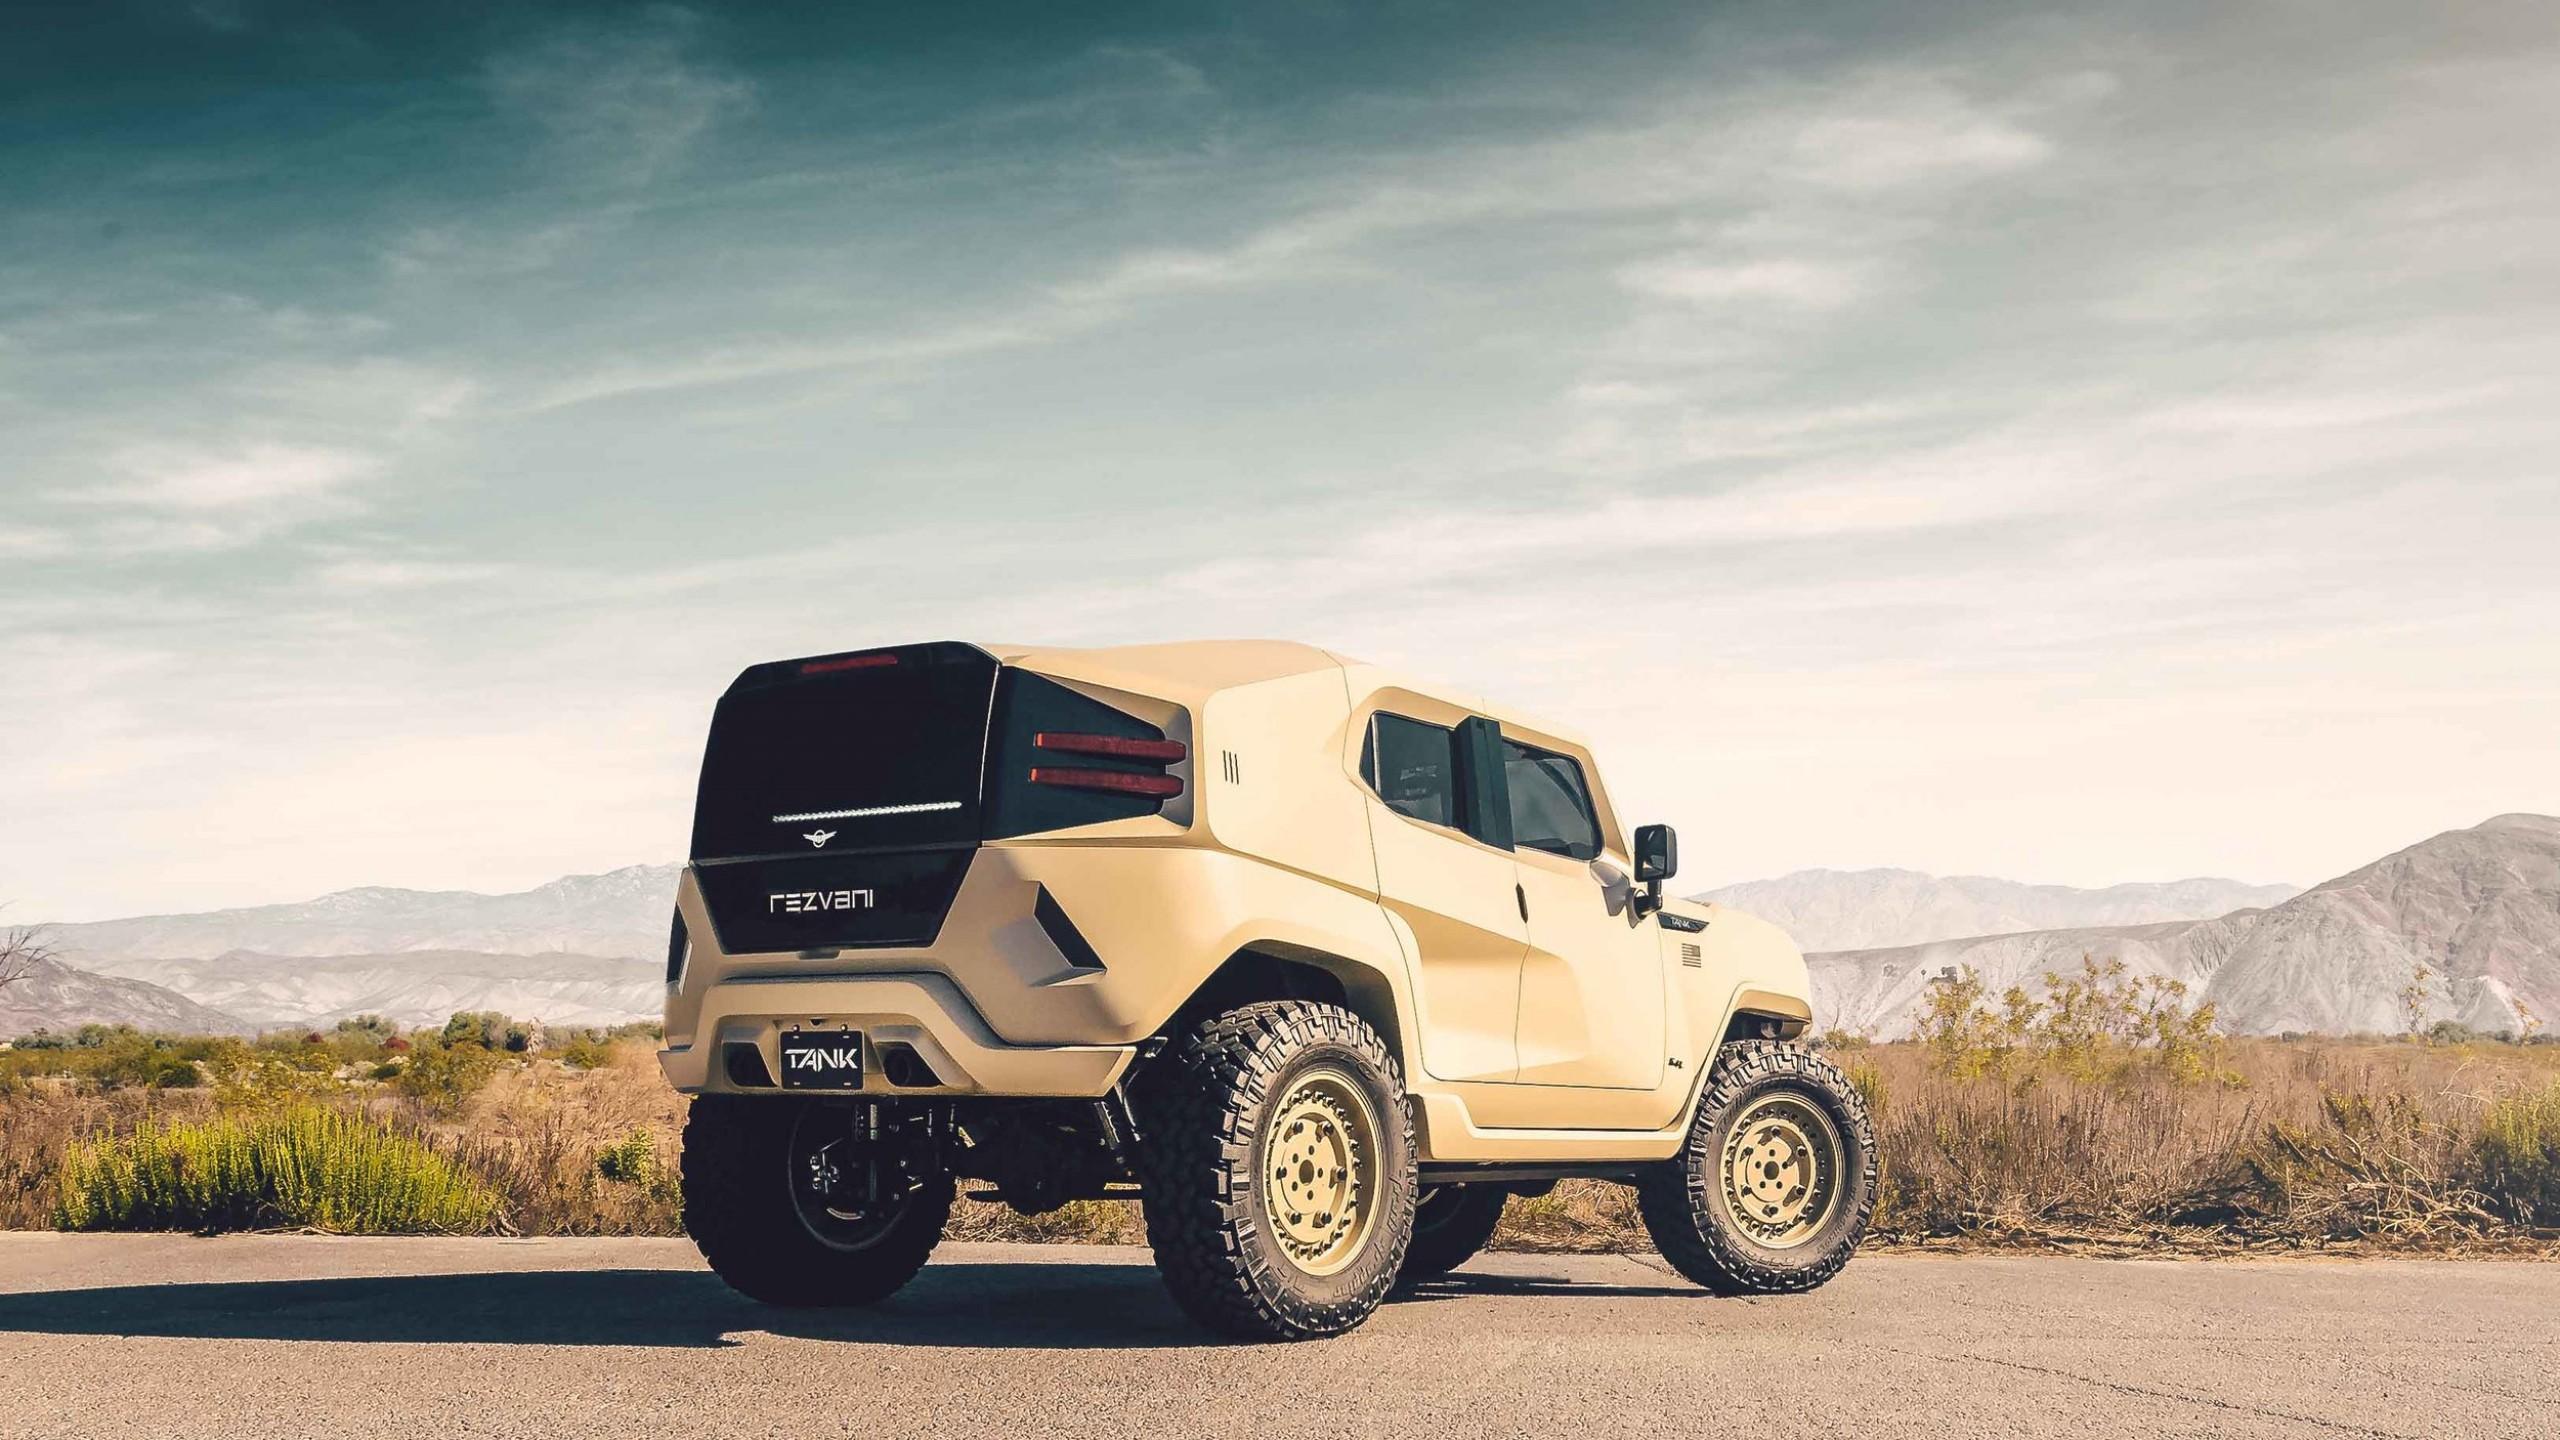 Wallpaper Rezvani Tank Military, SUV, 2018 Cars, HD, Cars ...